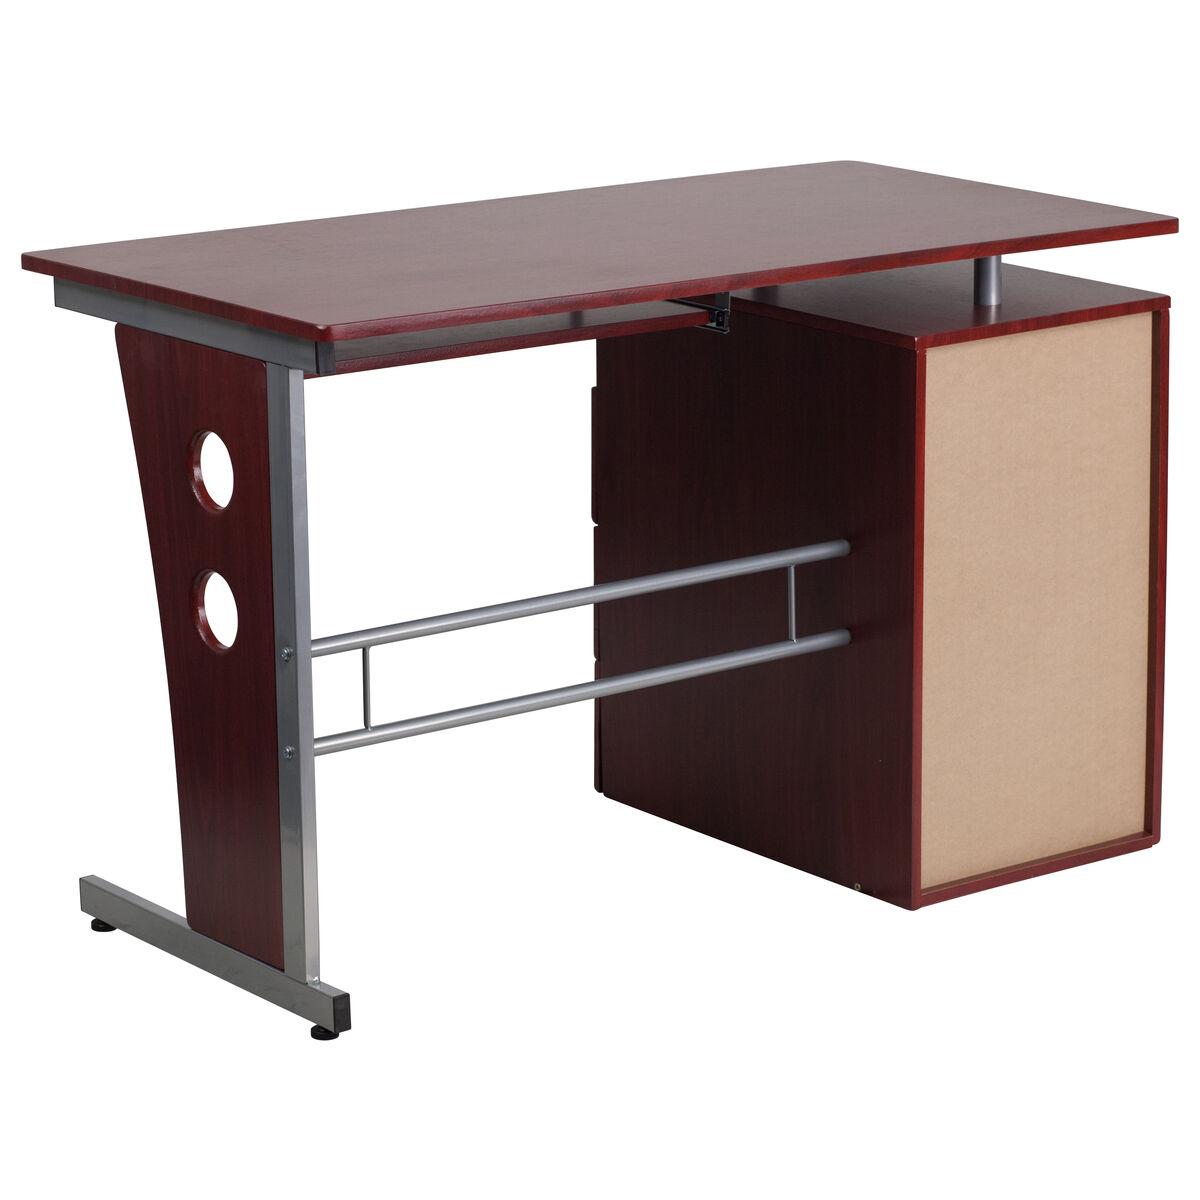 Mahogany Desk Nan Wk 008 Gg Bizchair Com